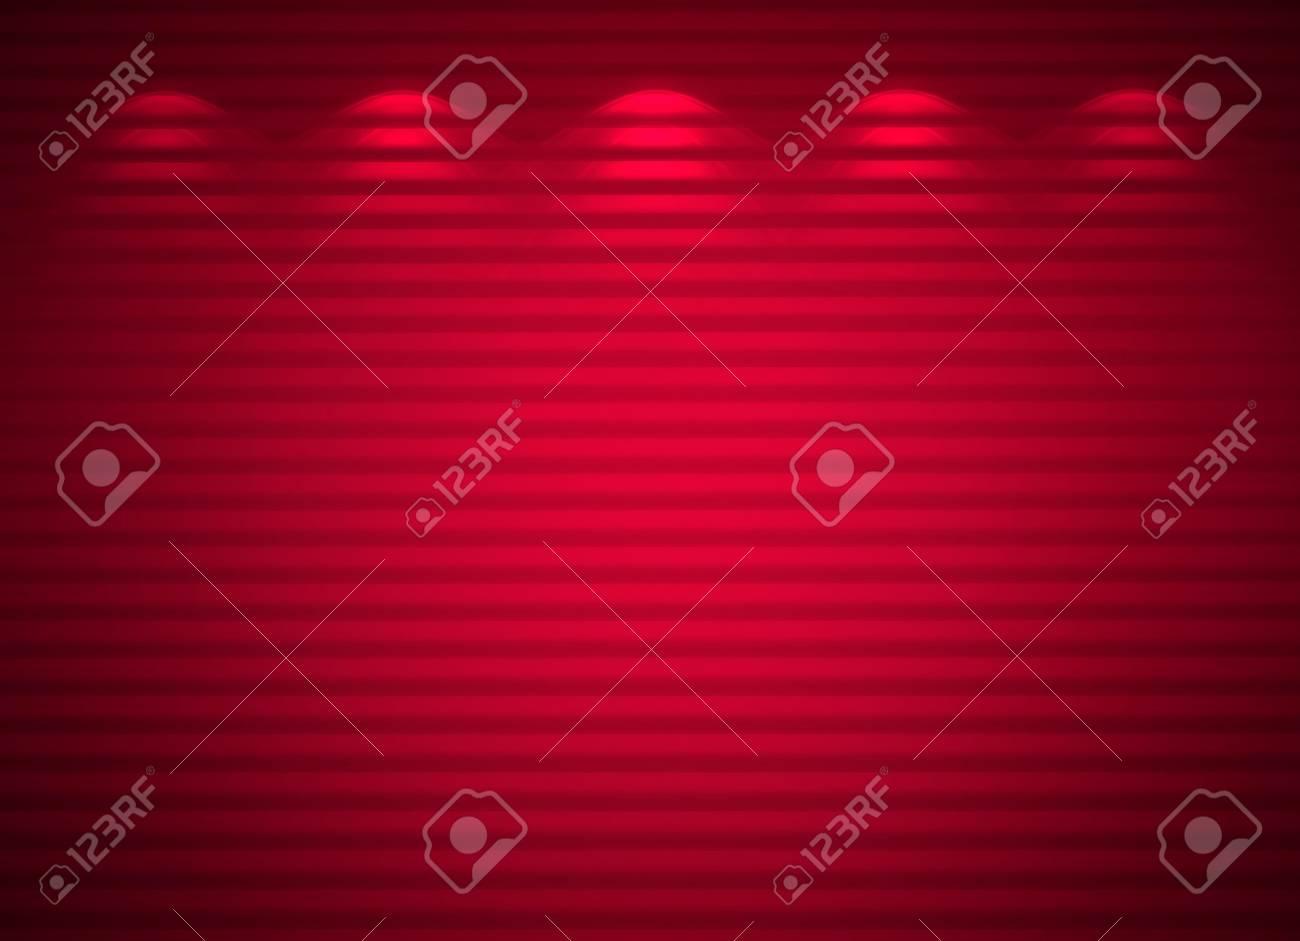 Illuminated pink wall, abstract background Stock Photo - 13159279